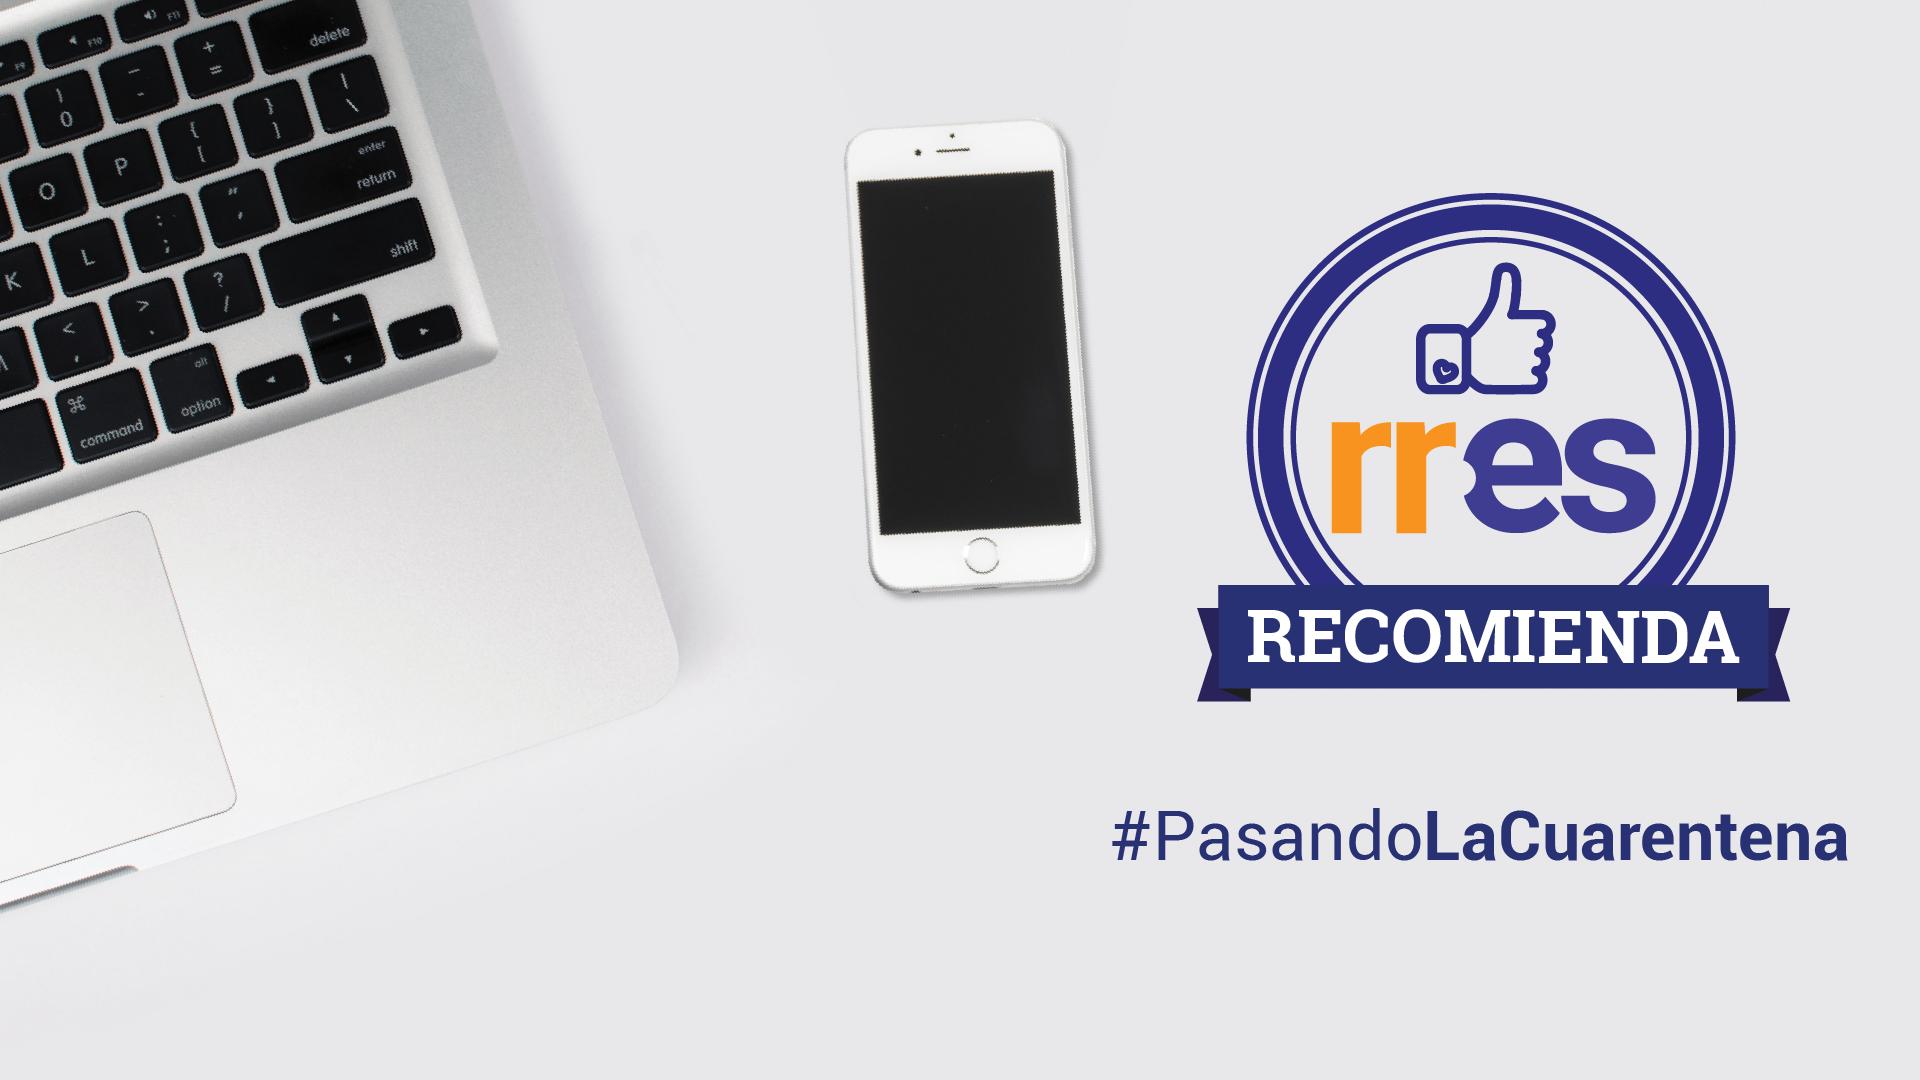 #PasandoLaCuarentena   6 cursos gratis de Google Actívate con certificado #22Abr